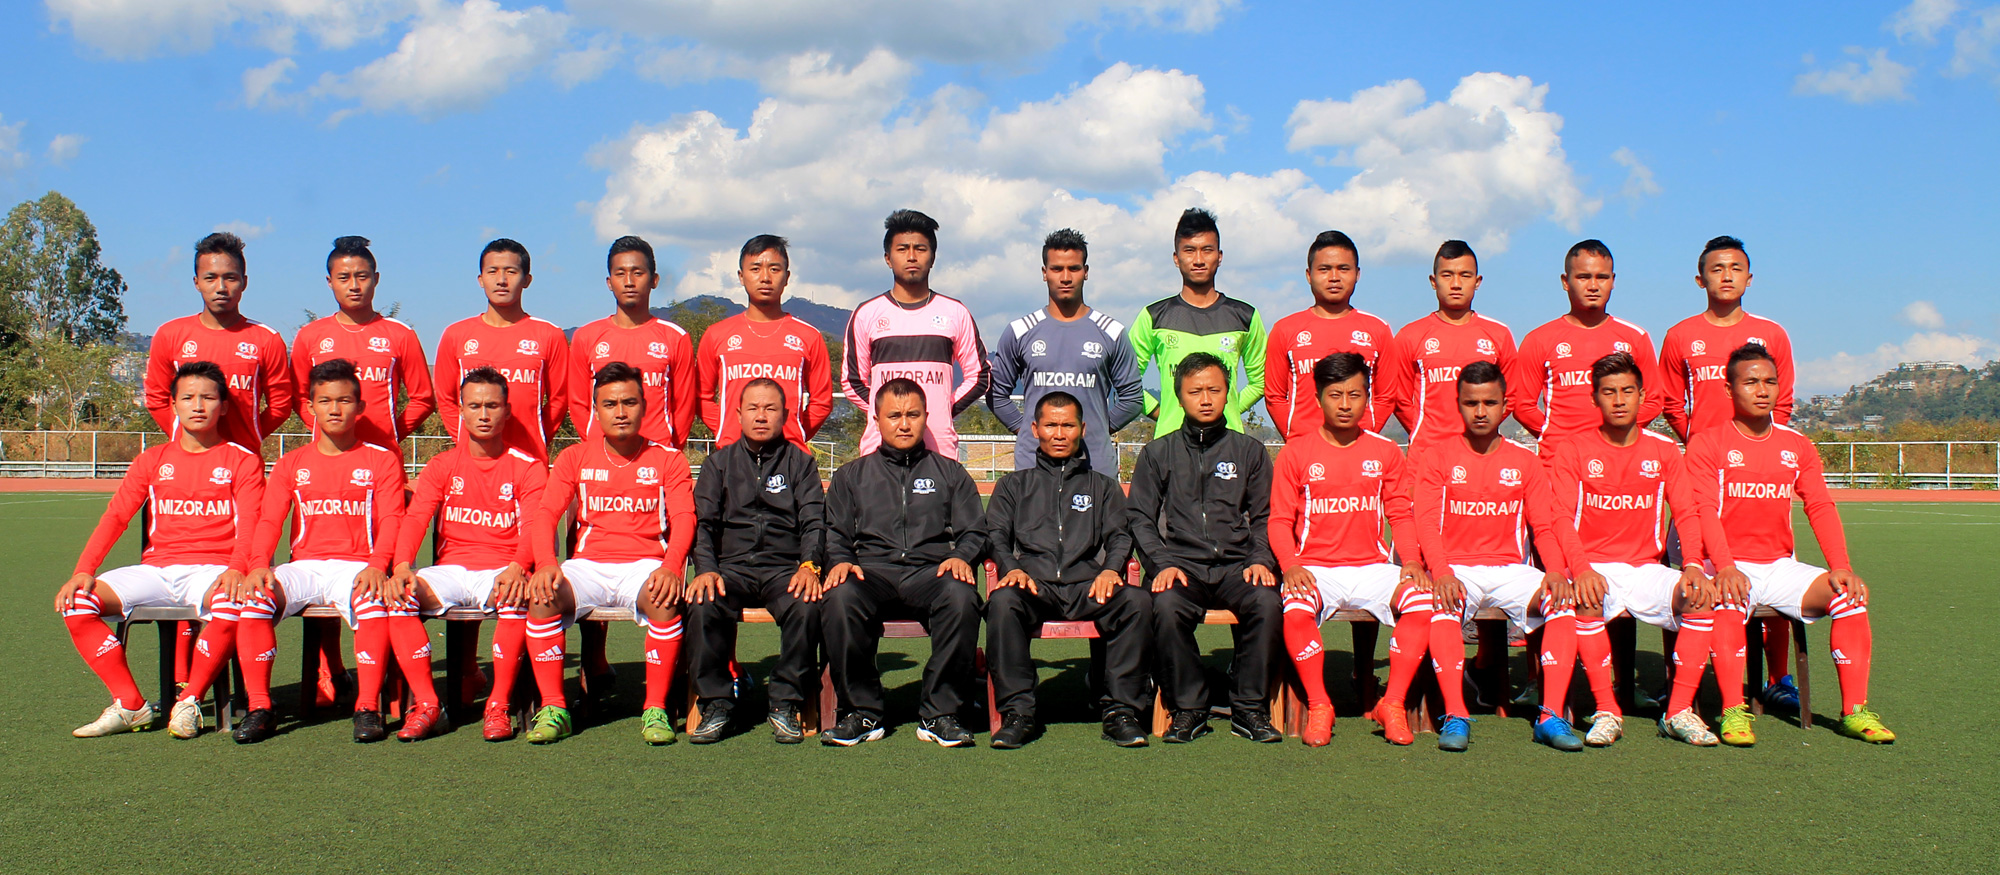 Mizoram team a chiang ta